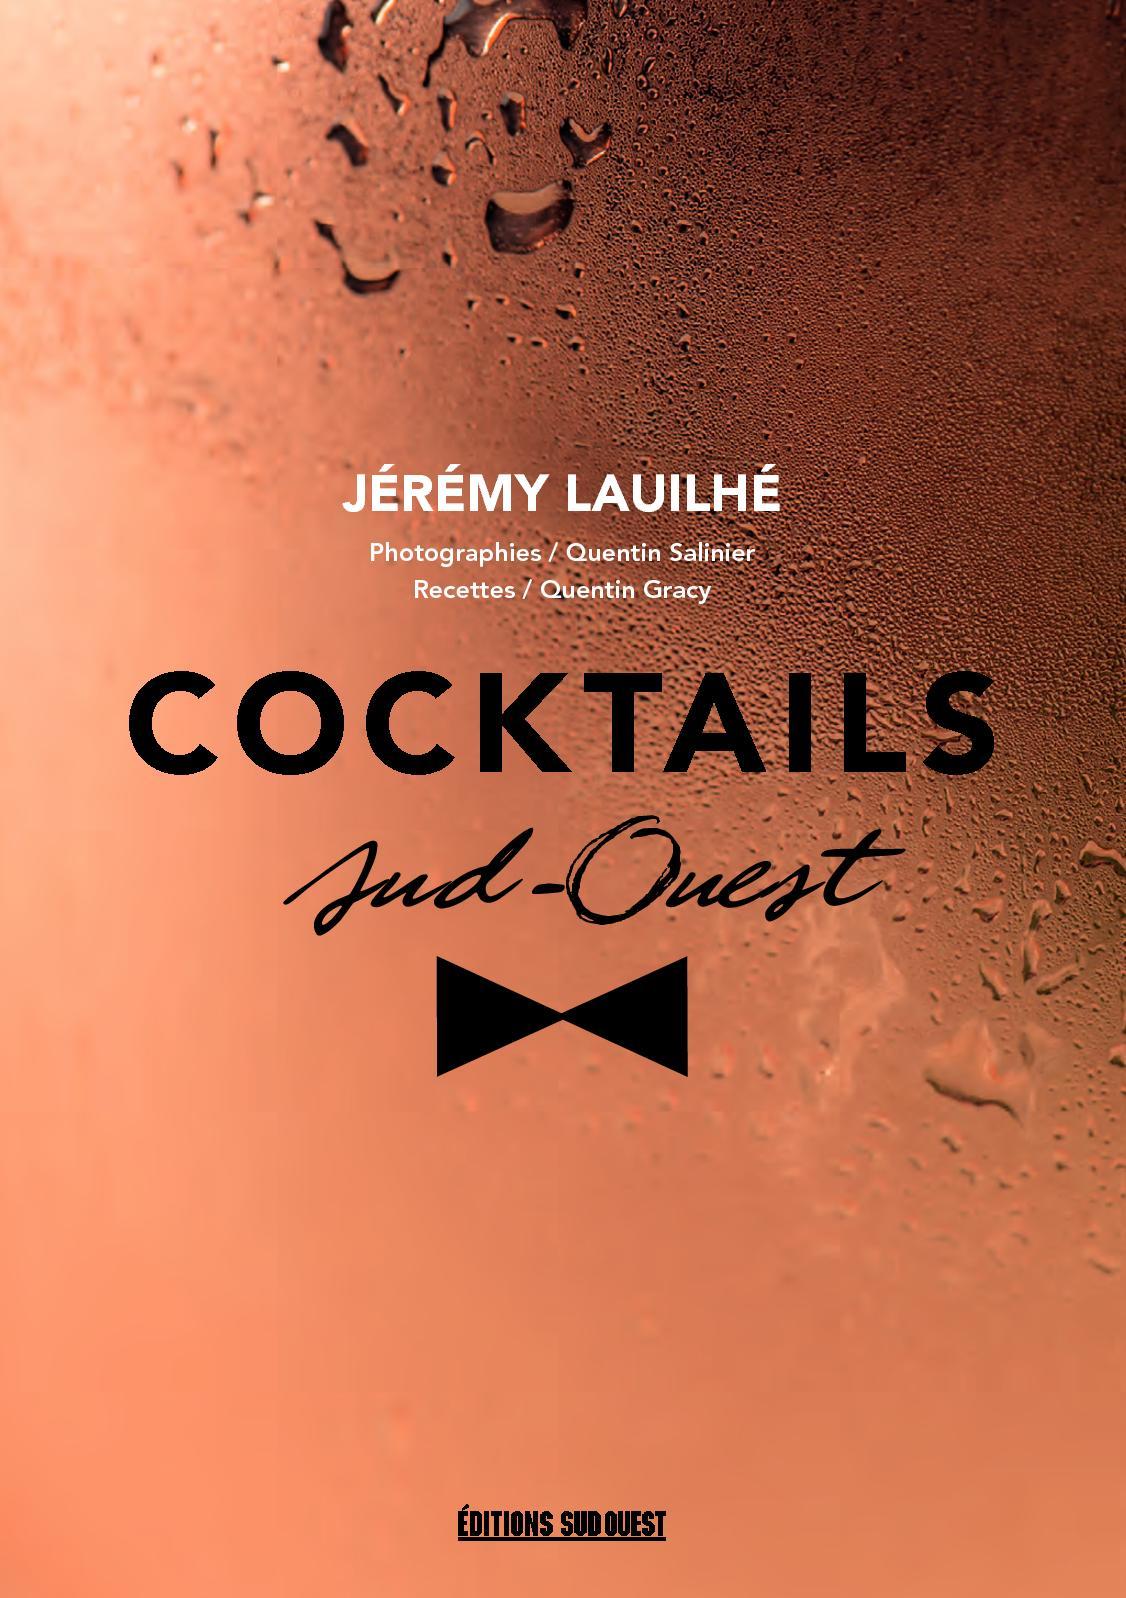 Cocktails Sud-Ouest